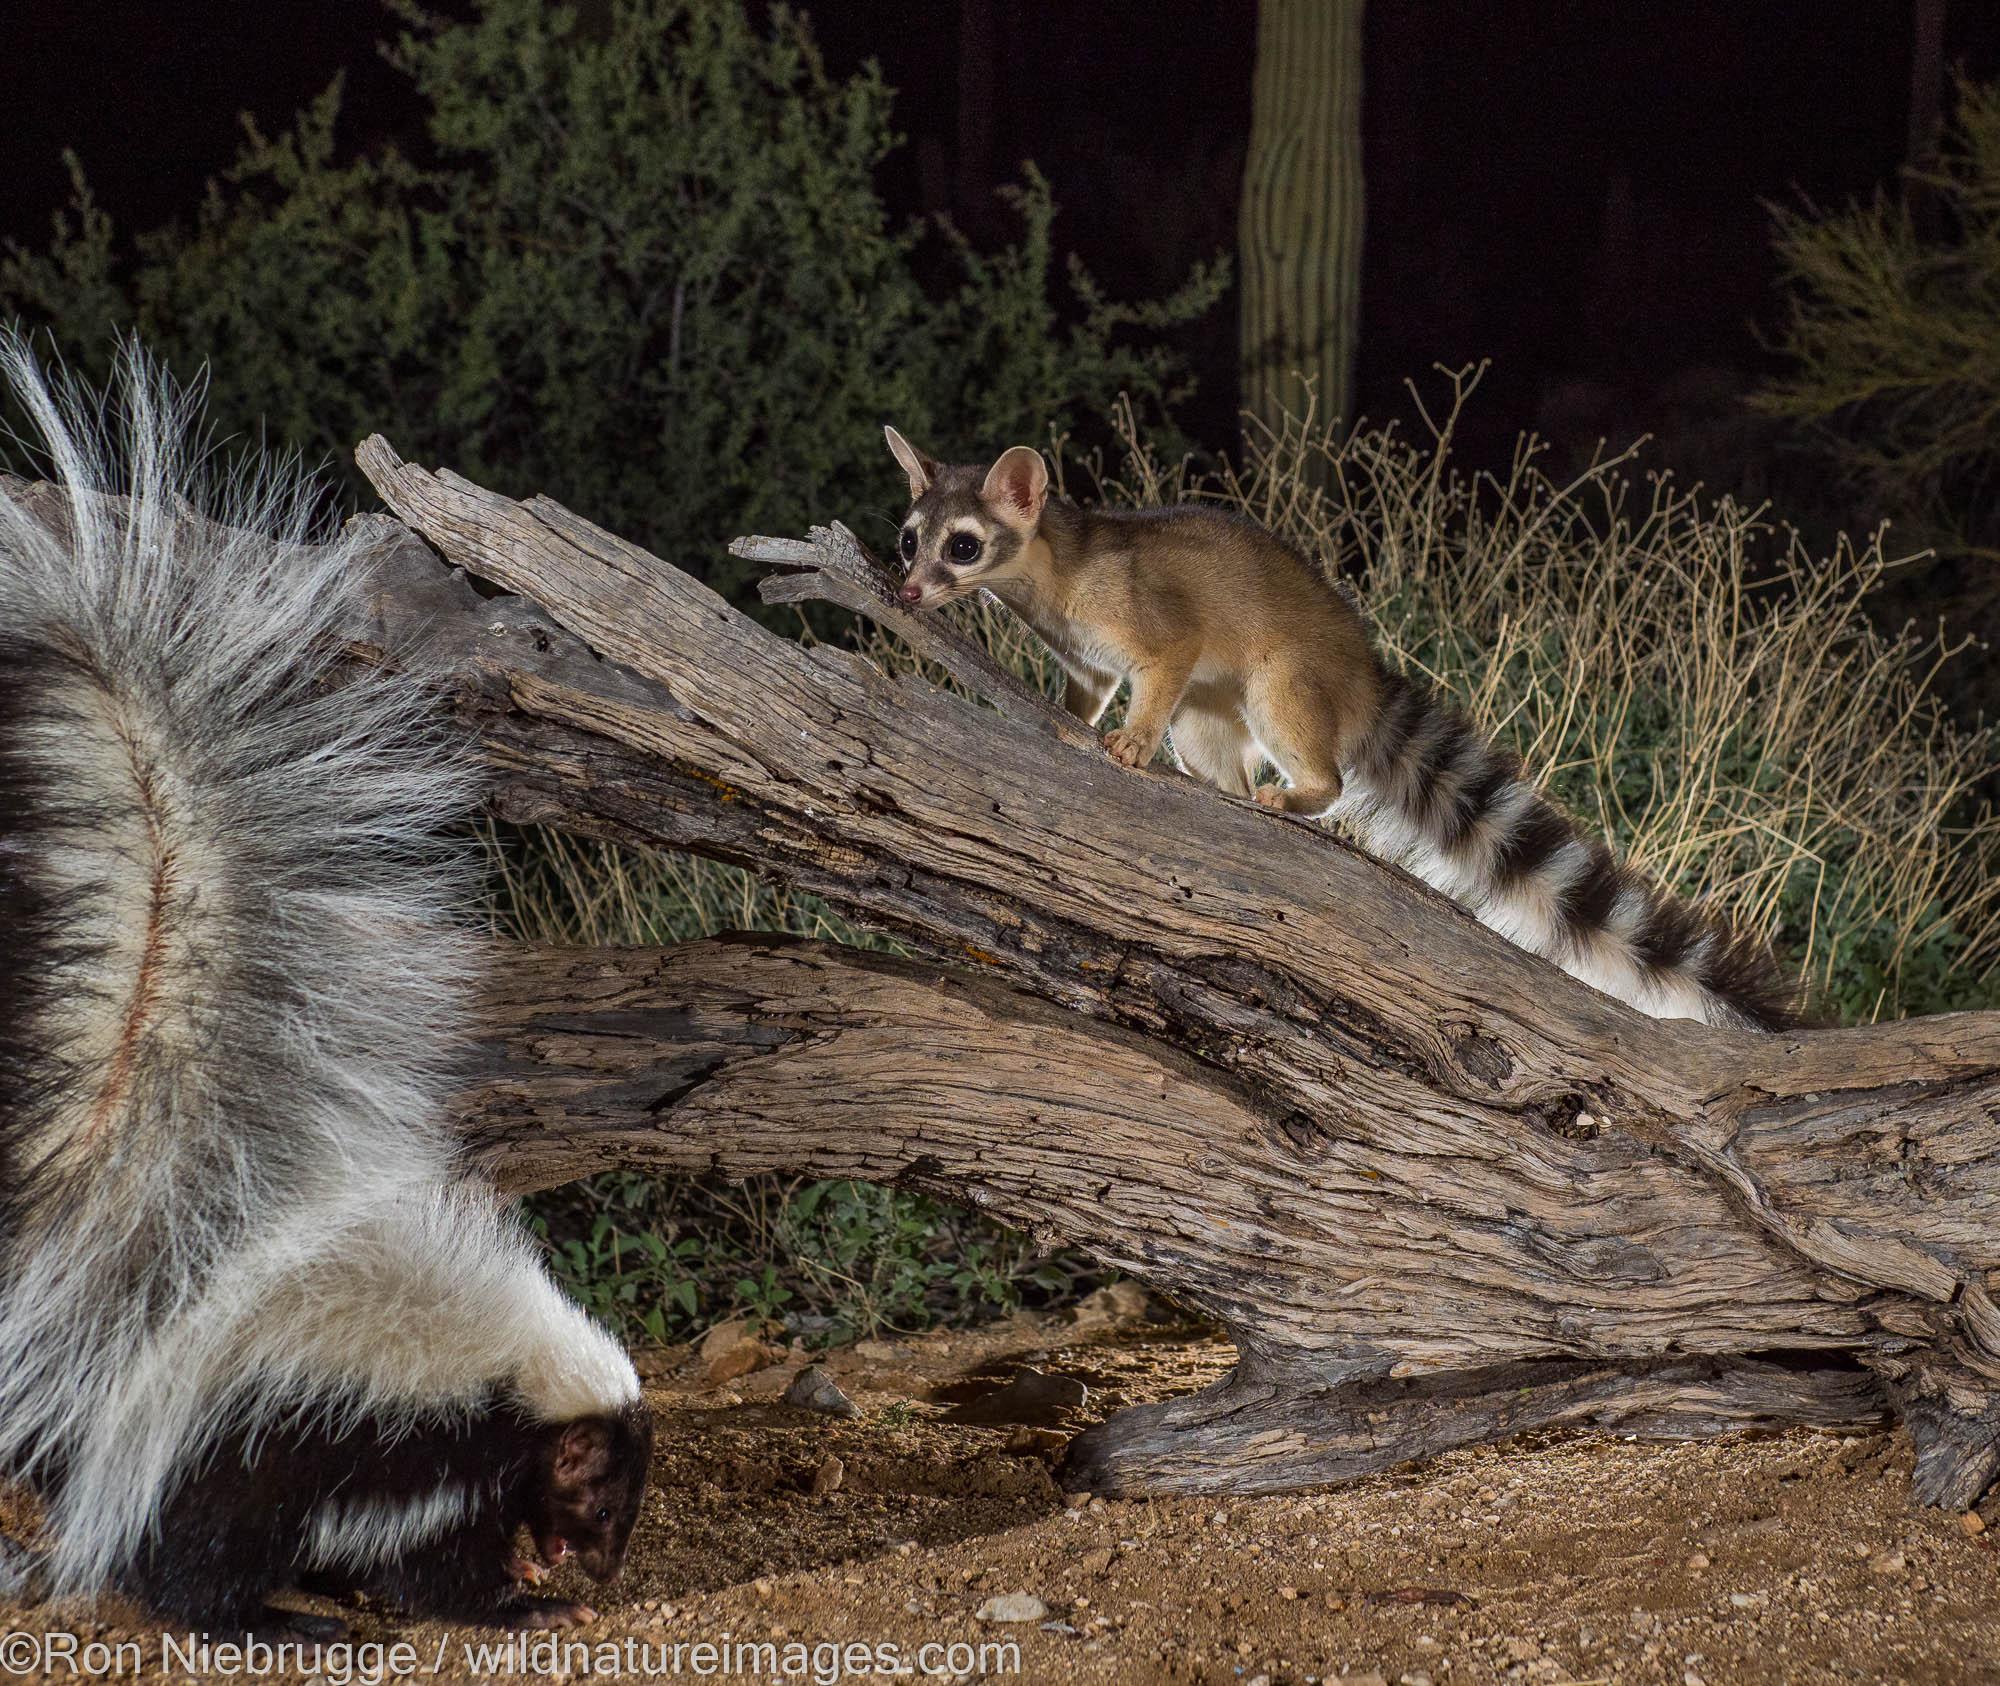 Ringtail and Hooded Skunk, Tortolita Mountains, Marana, near Tucson, Arizona.